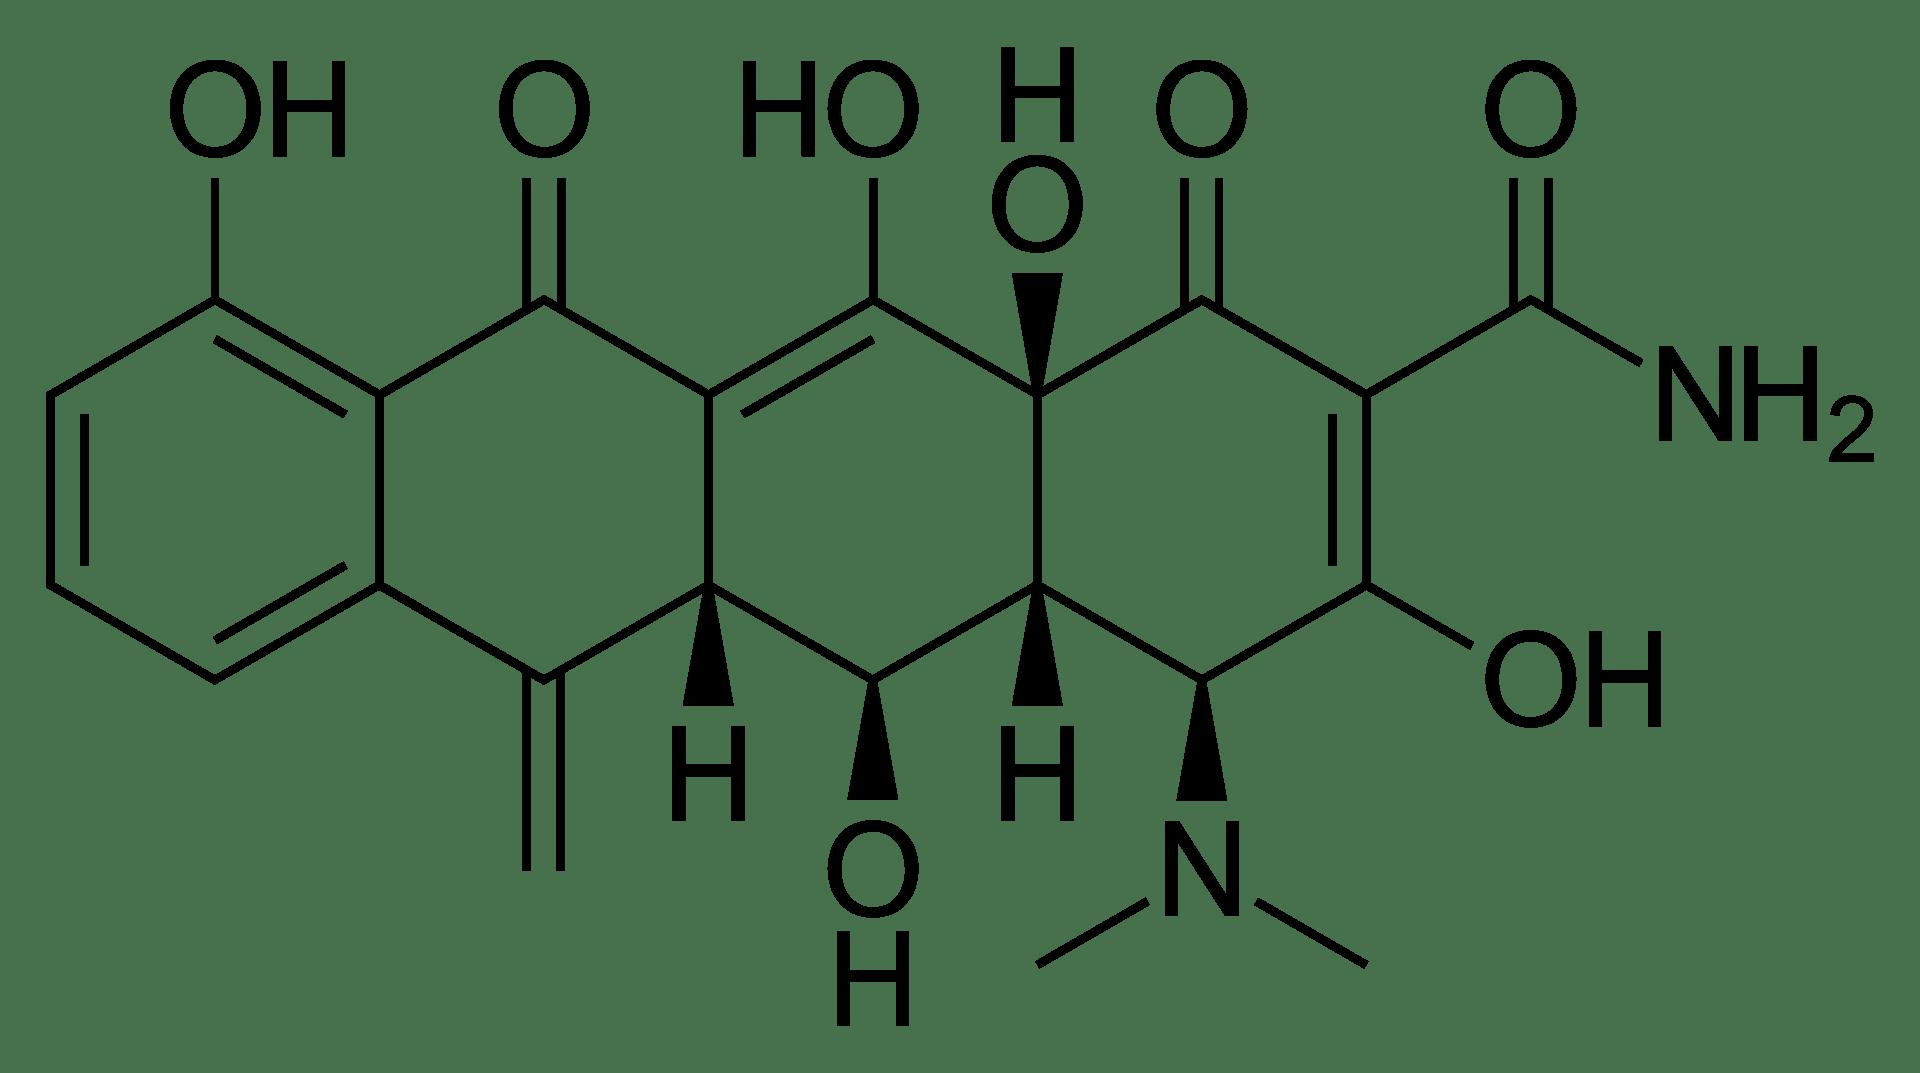 Почему антибиотик смог помочь при вирусном заболевании мозга?